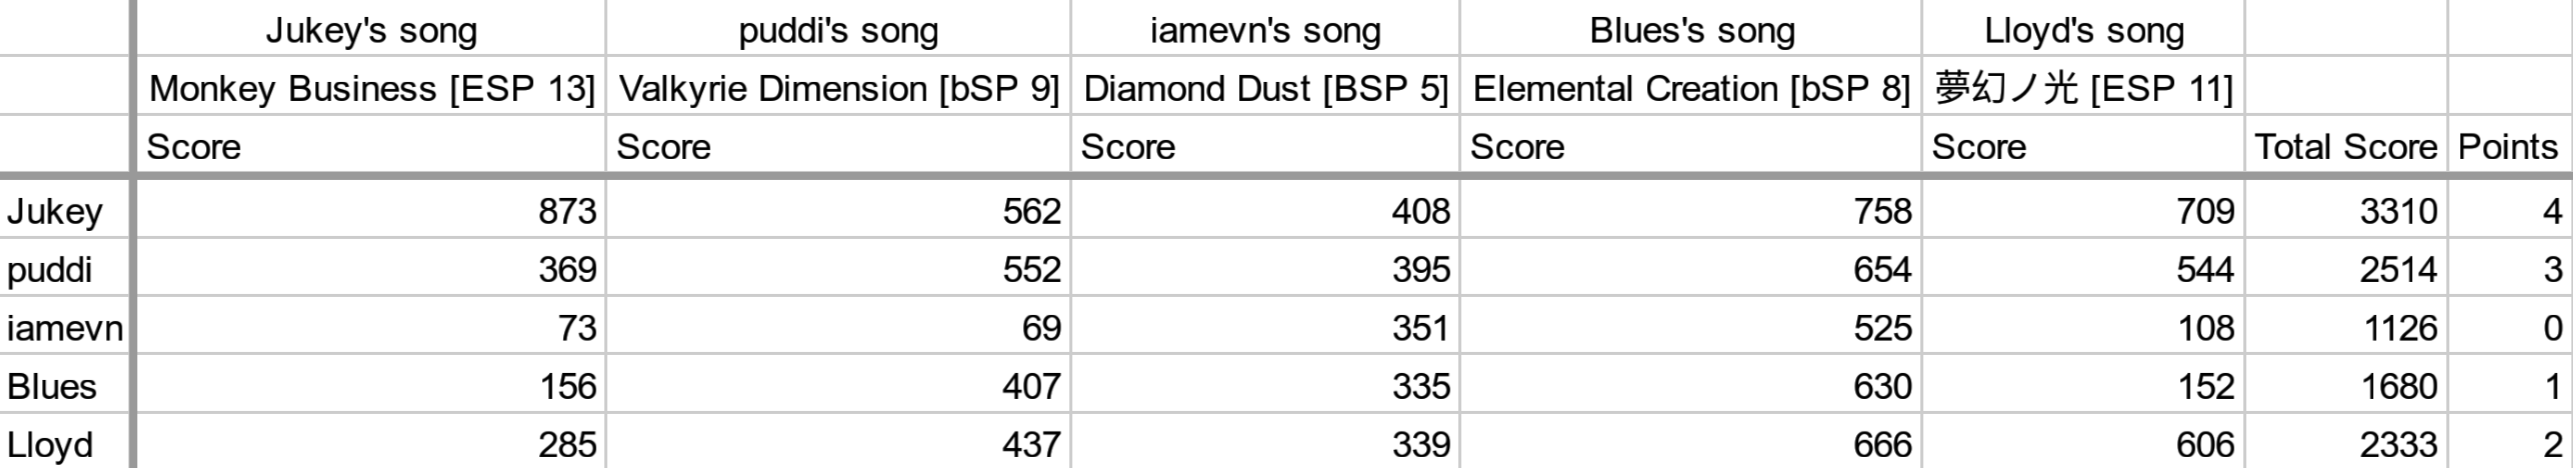 BSS-DDR-scores